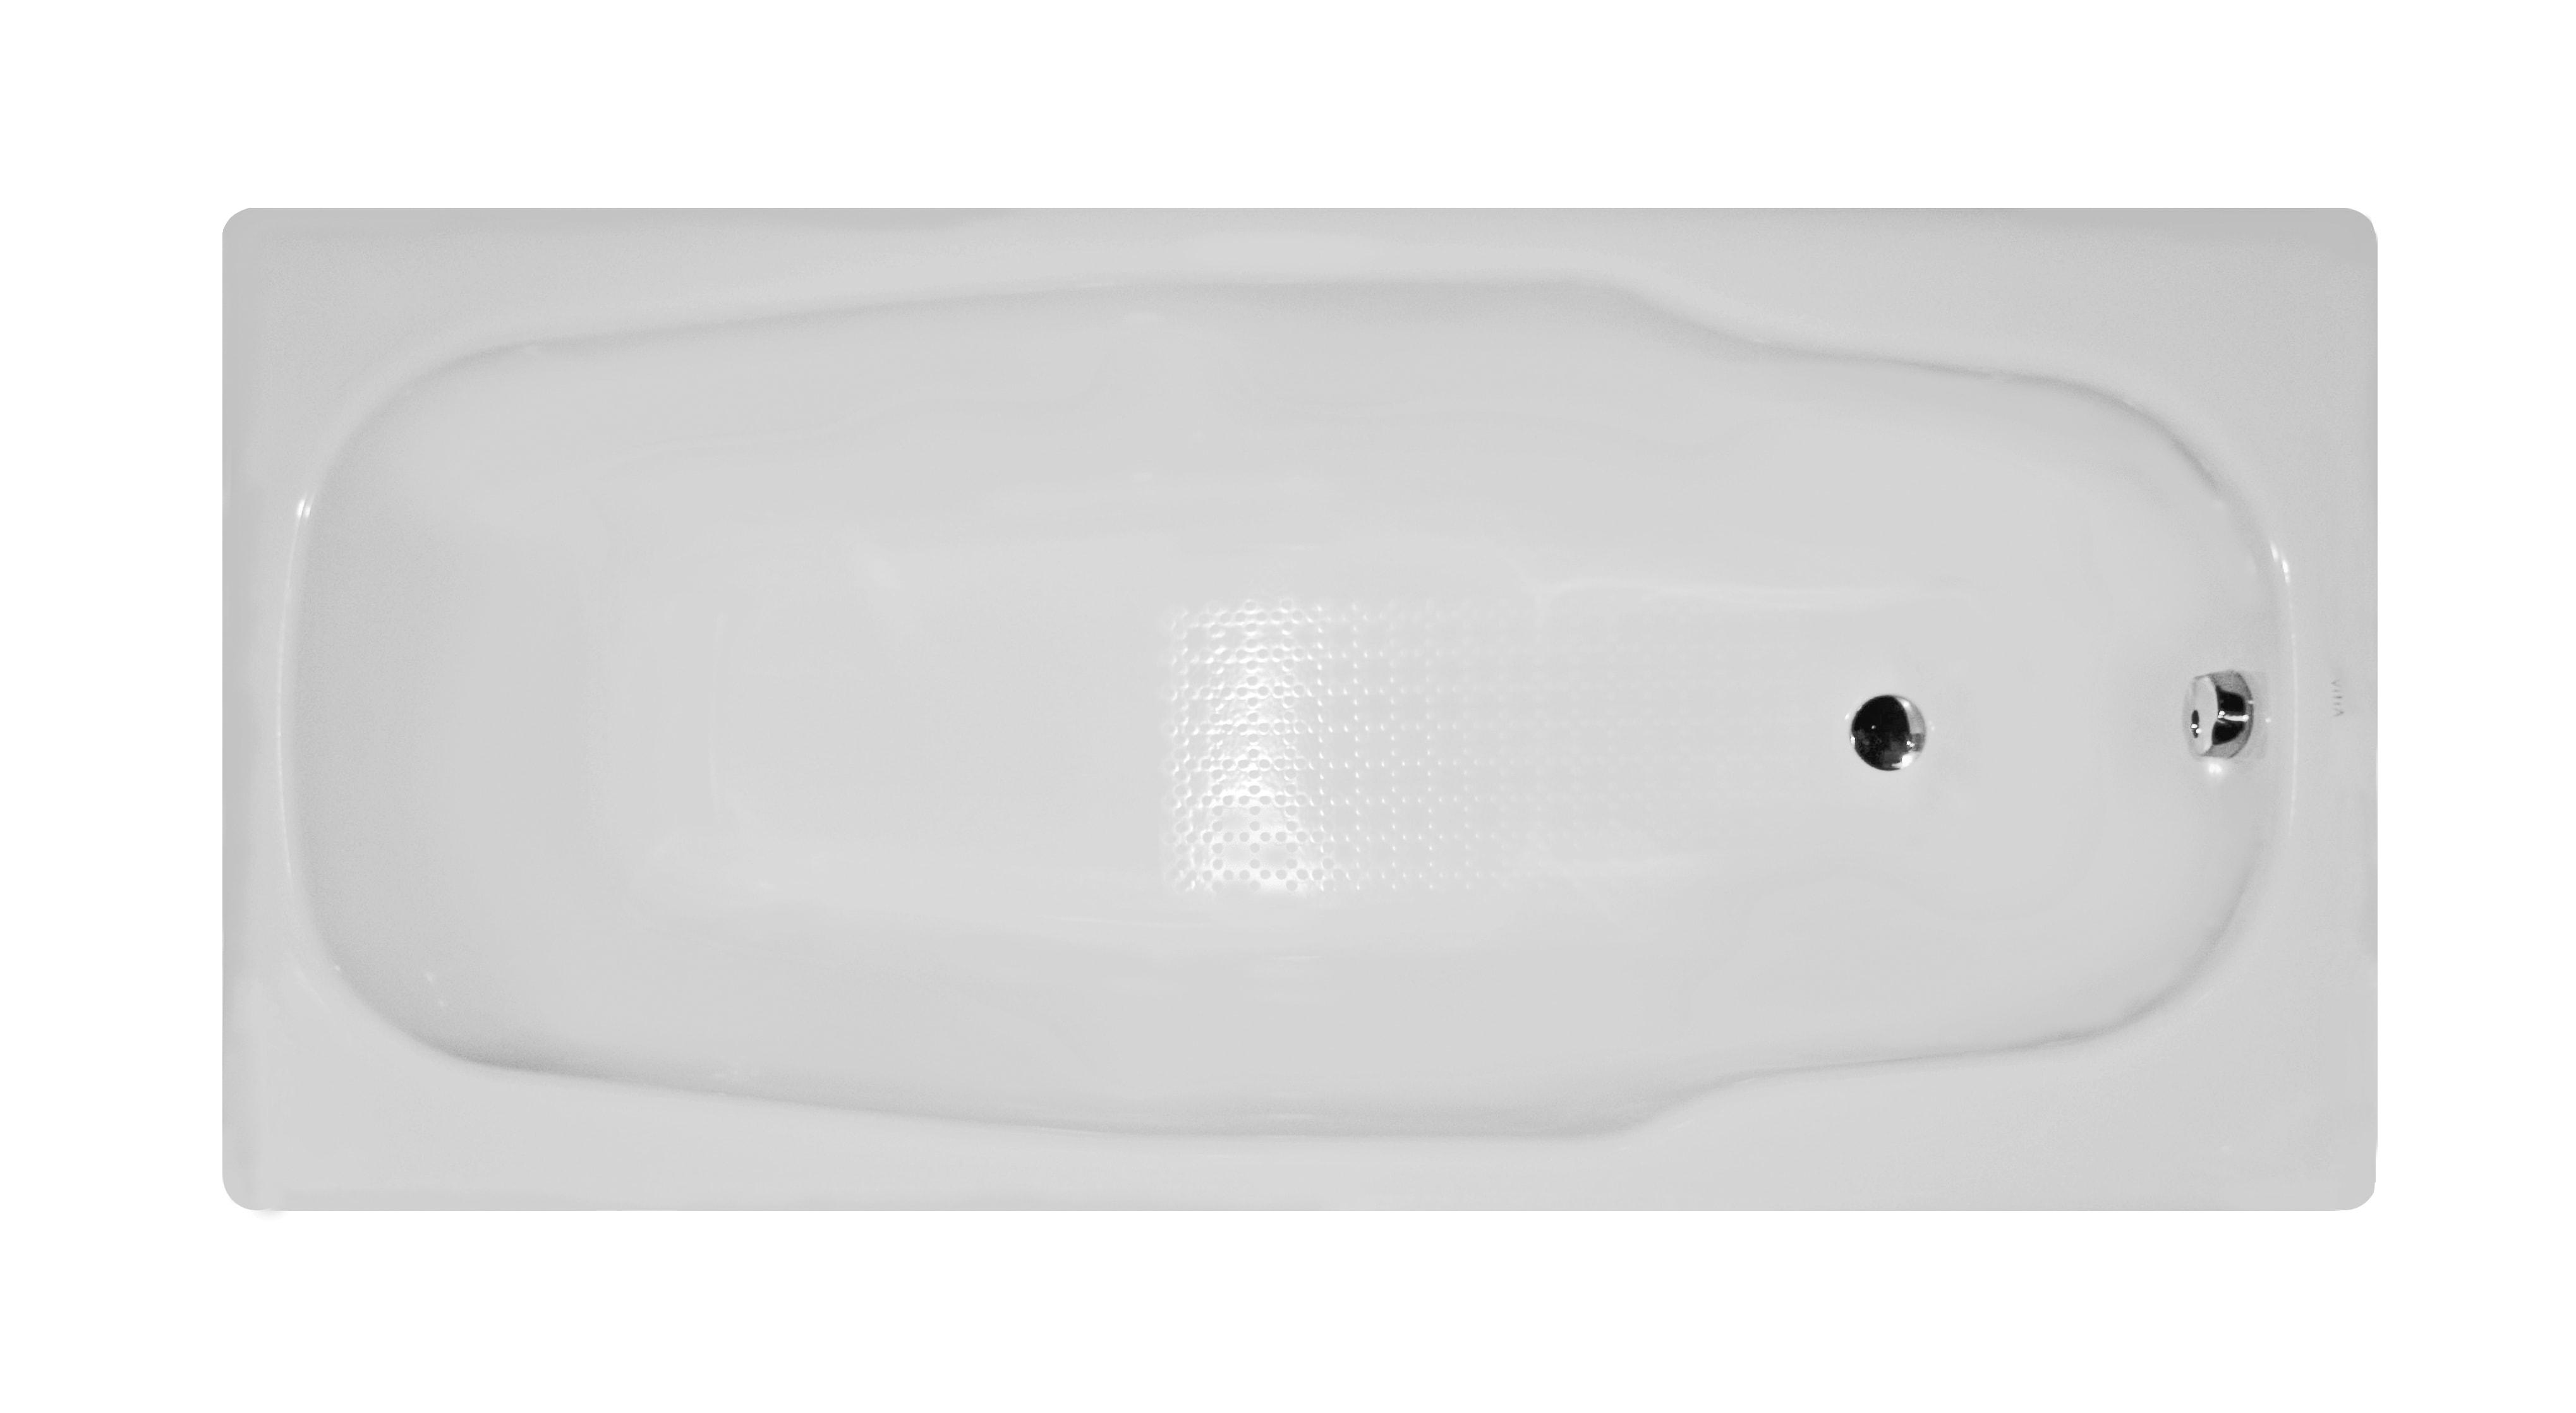 Stream 170×80 cm Steel Bathtub, 3.5 Mm, Sound Proofing Pad